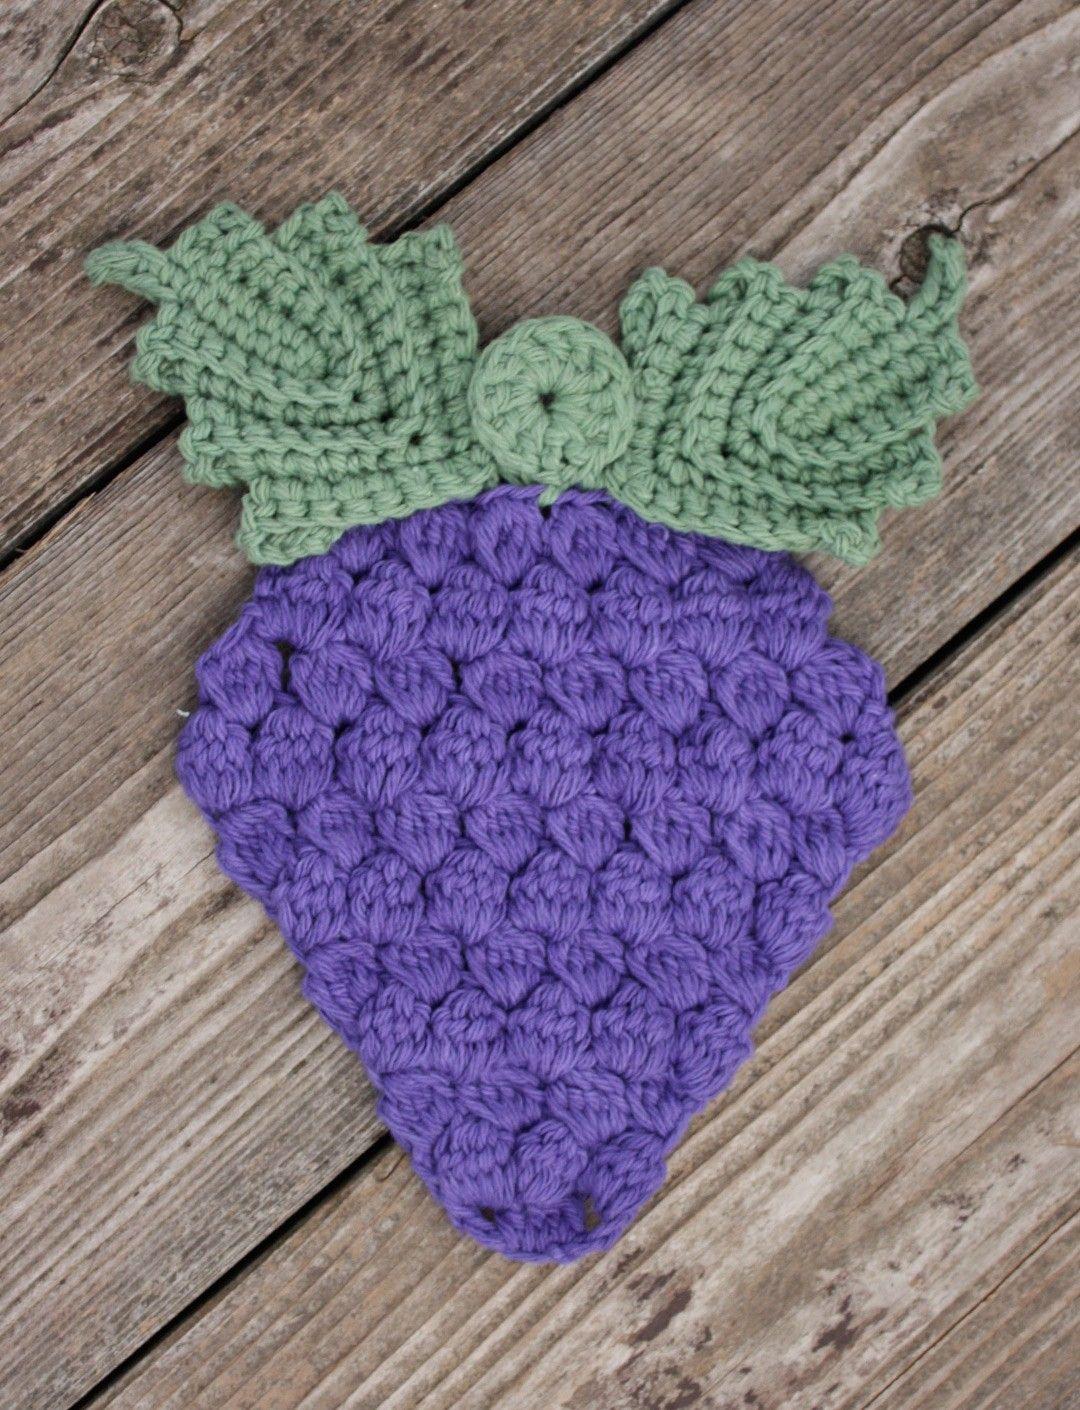 Crochet Grape Bunch Potholder - Tutorial~k8~ | Knit and Crochet ...